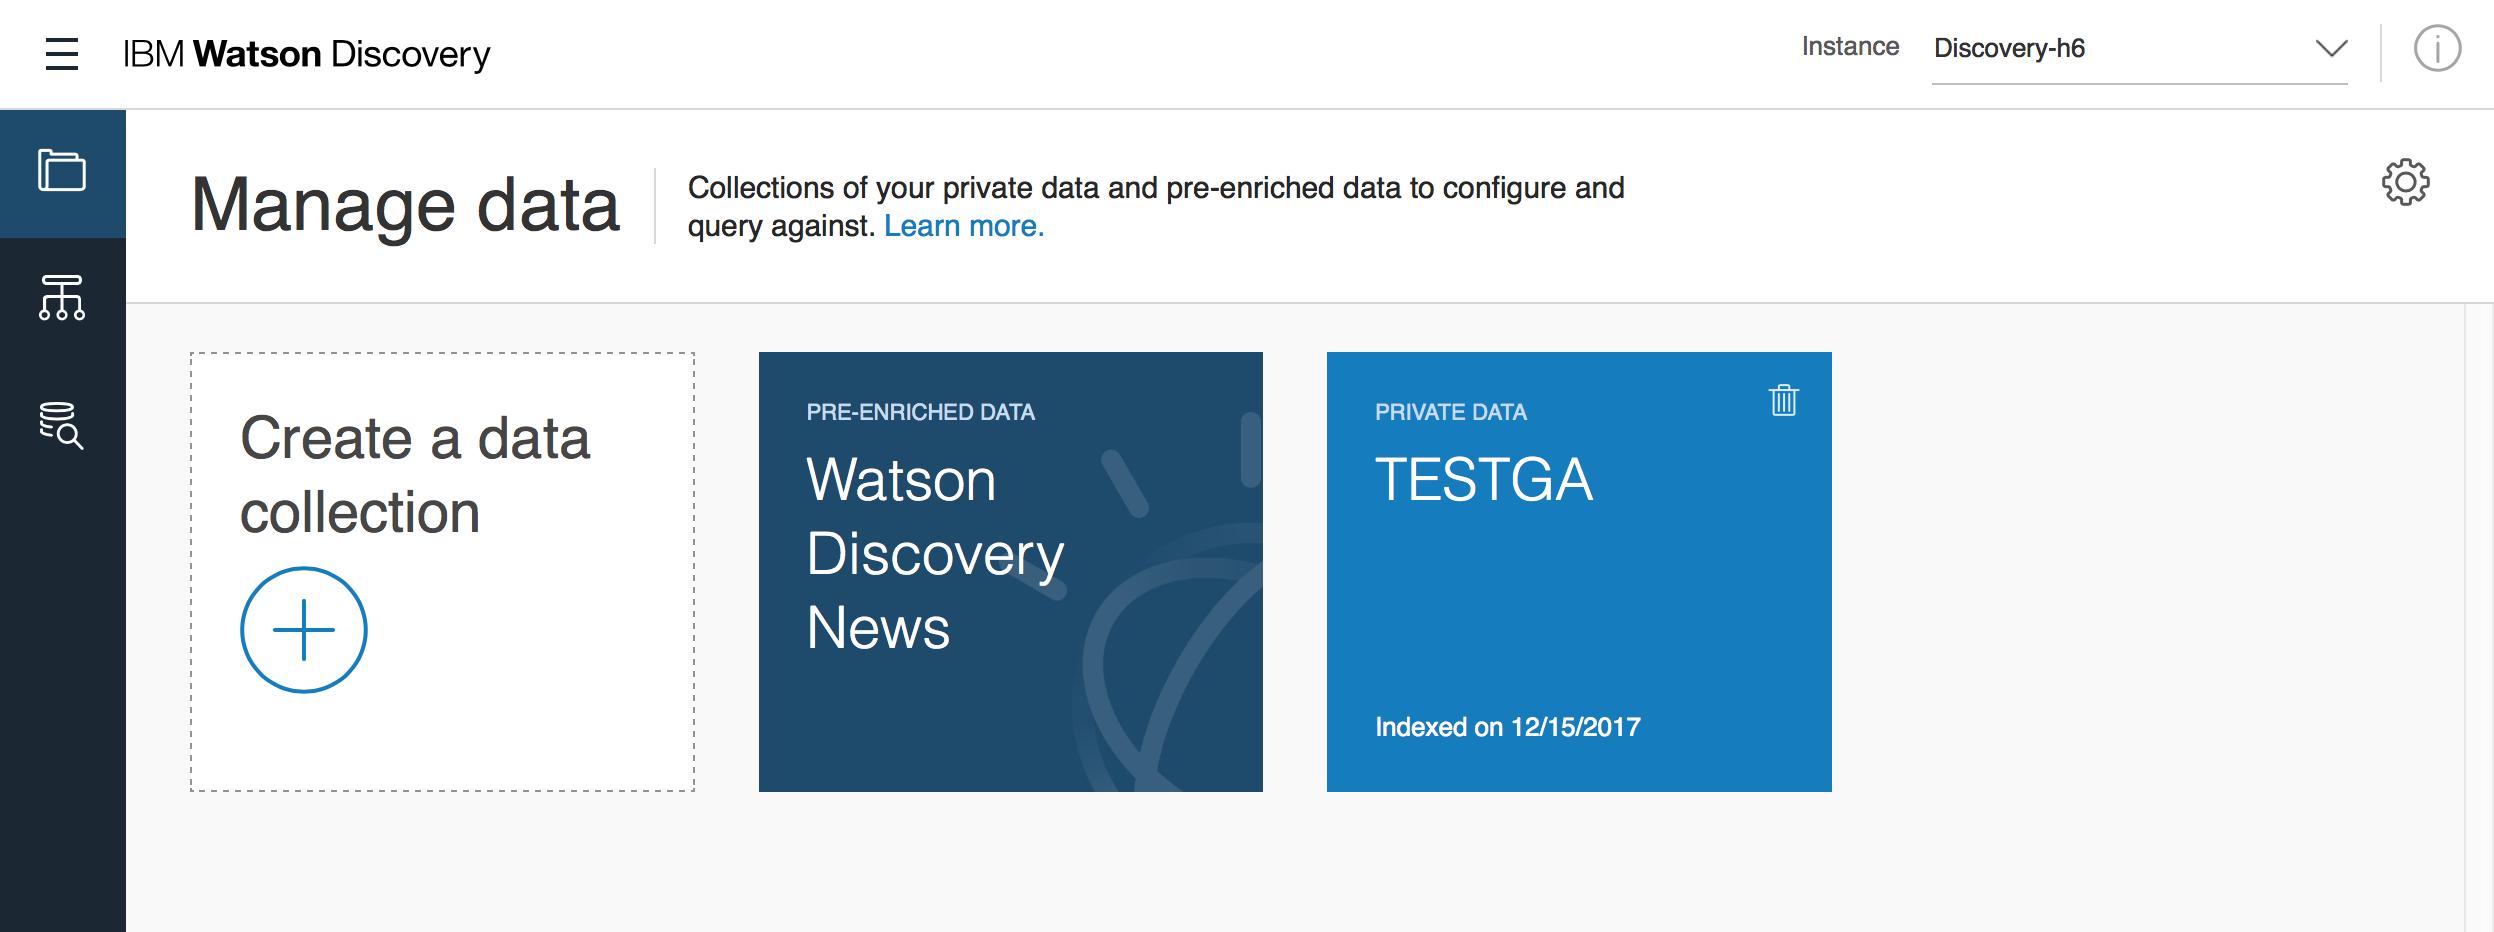 Watson Discoveryを触ってみた。 - Qiita